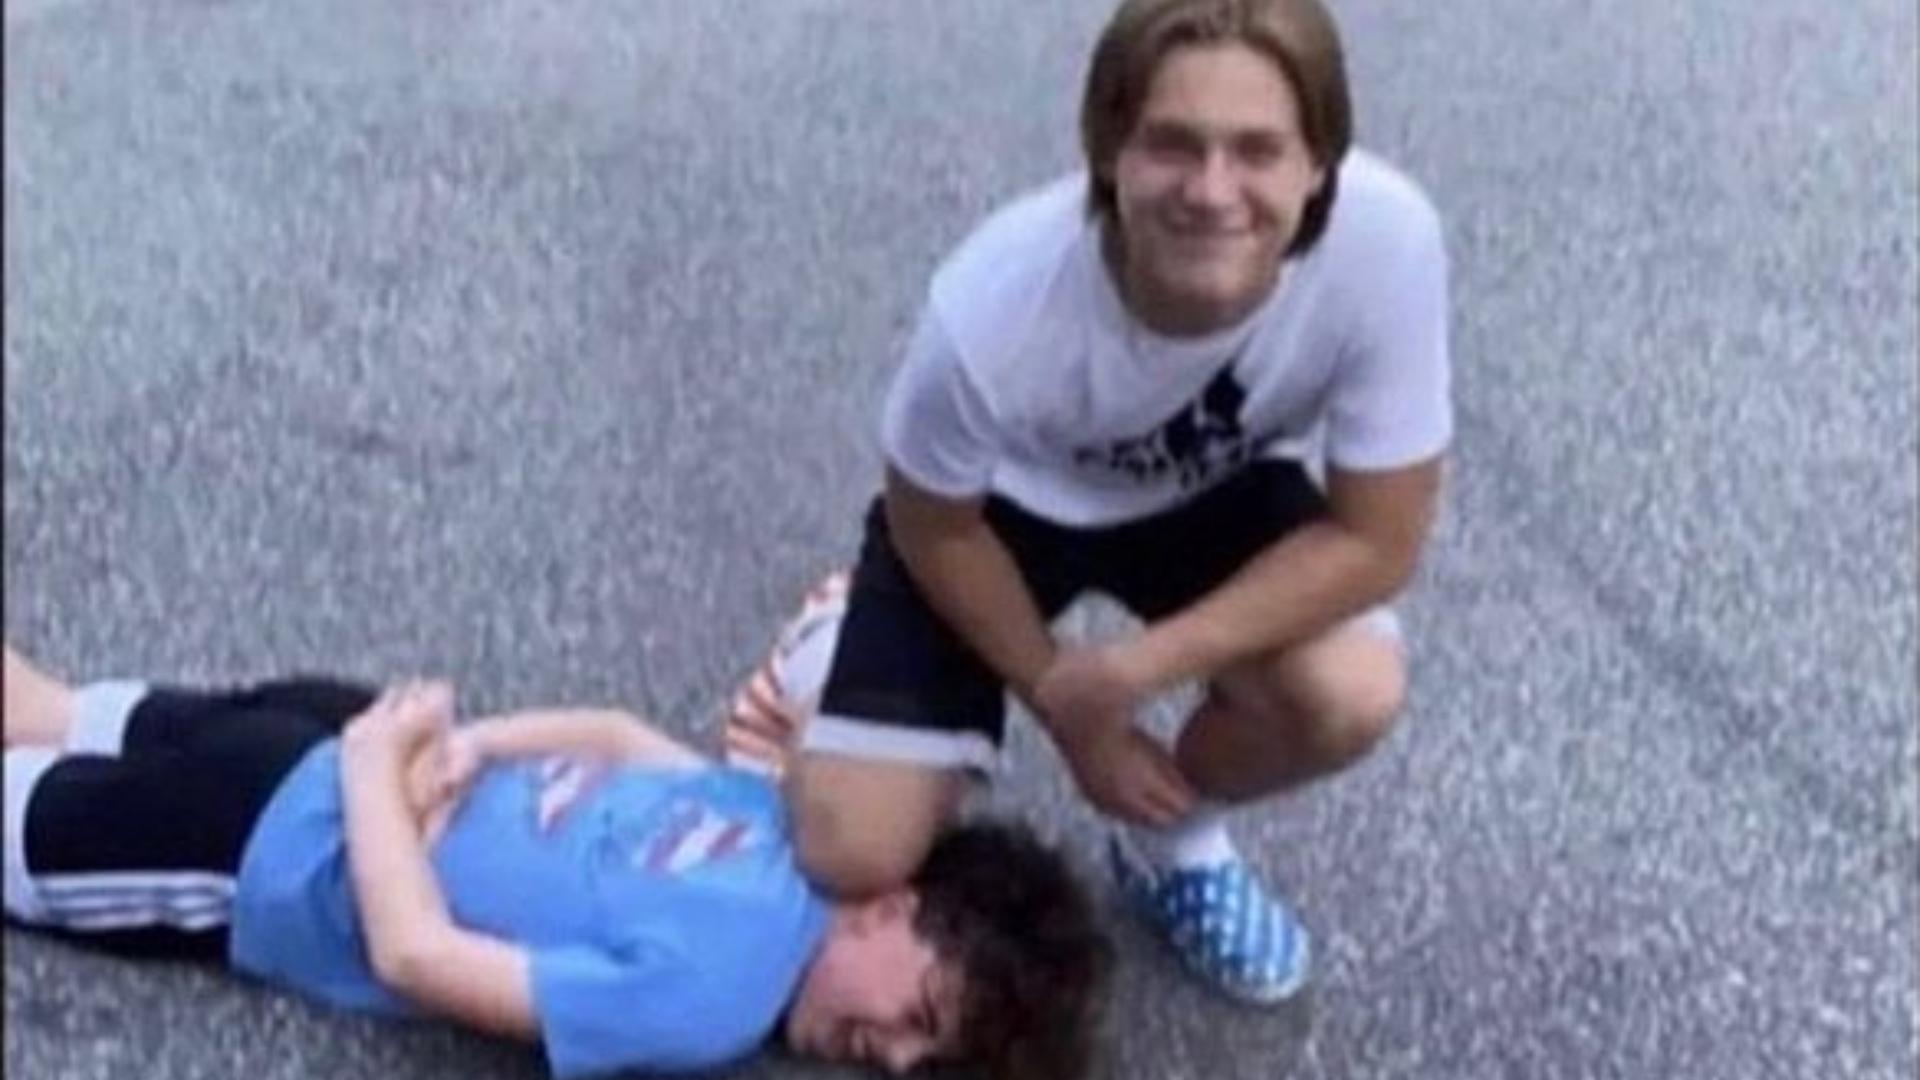 White teens start 'George Floyd' challenge mocking his death - TheGrio